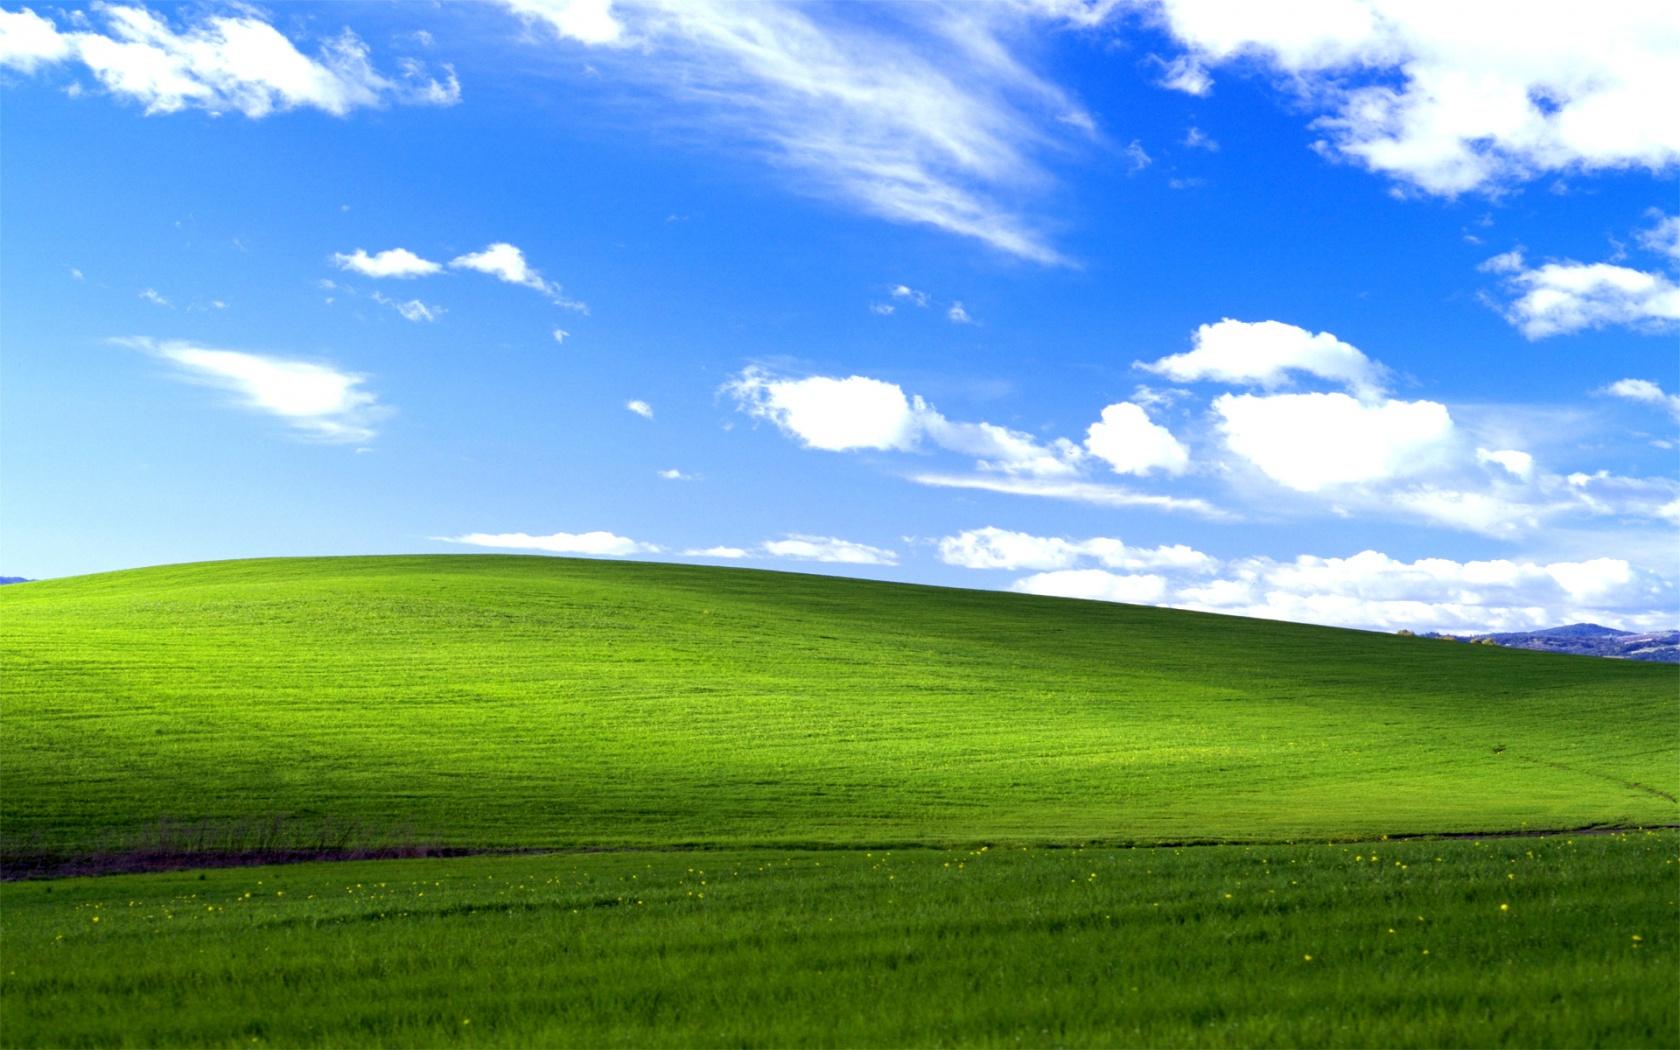 httpwwwsmscscomphotowallpaper desktop 1680x1050 windows xphtml 1680x1050